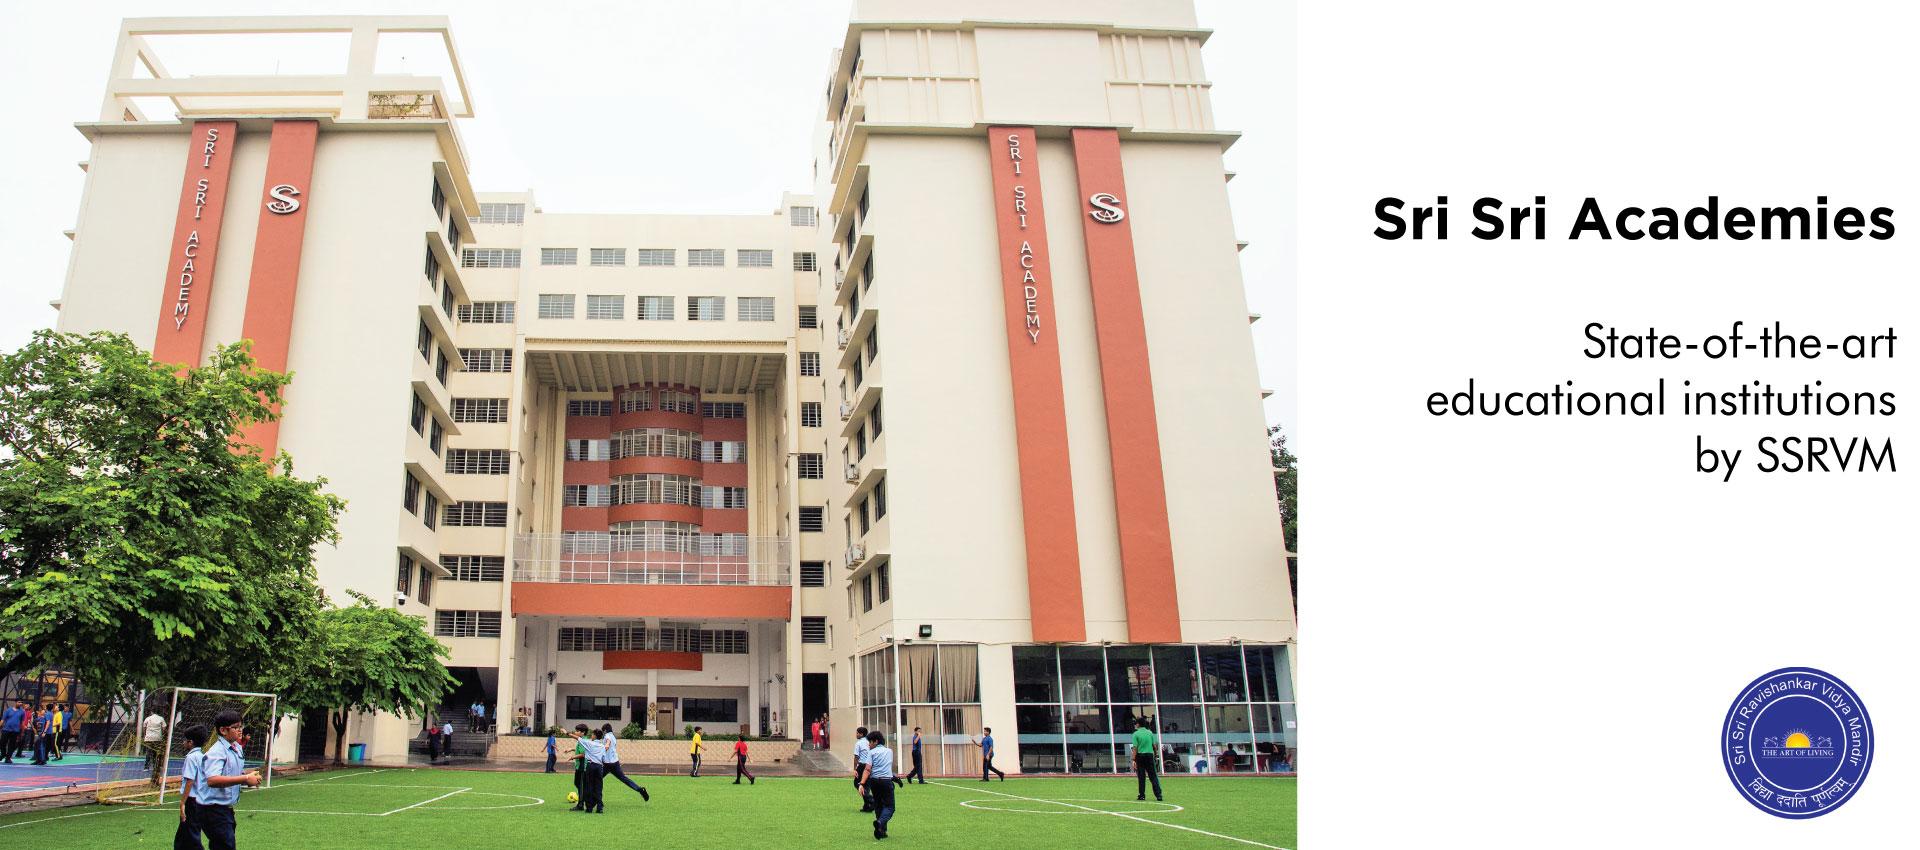 Sri Sri Academy, Kolkata, West Bengal